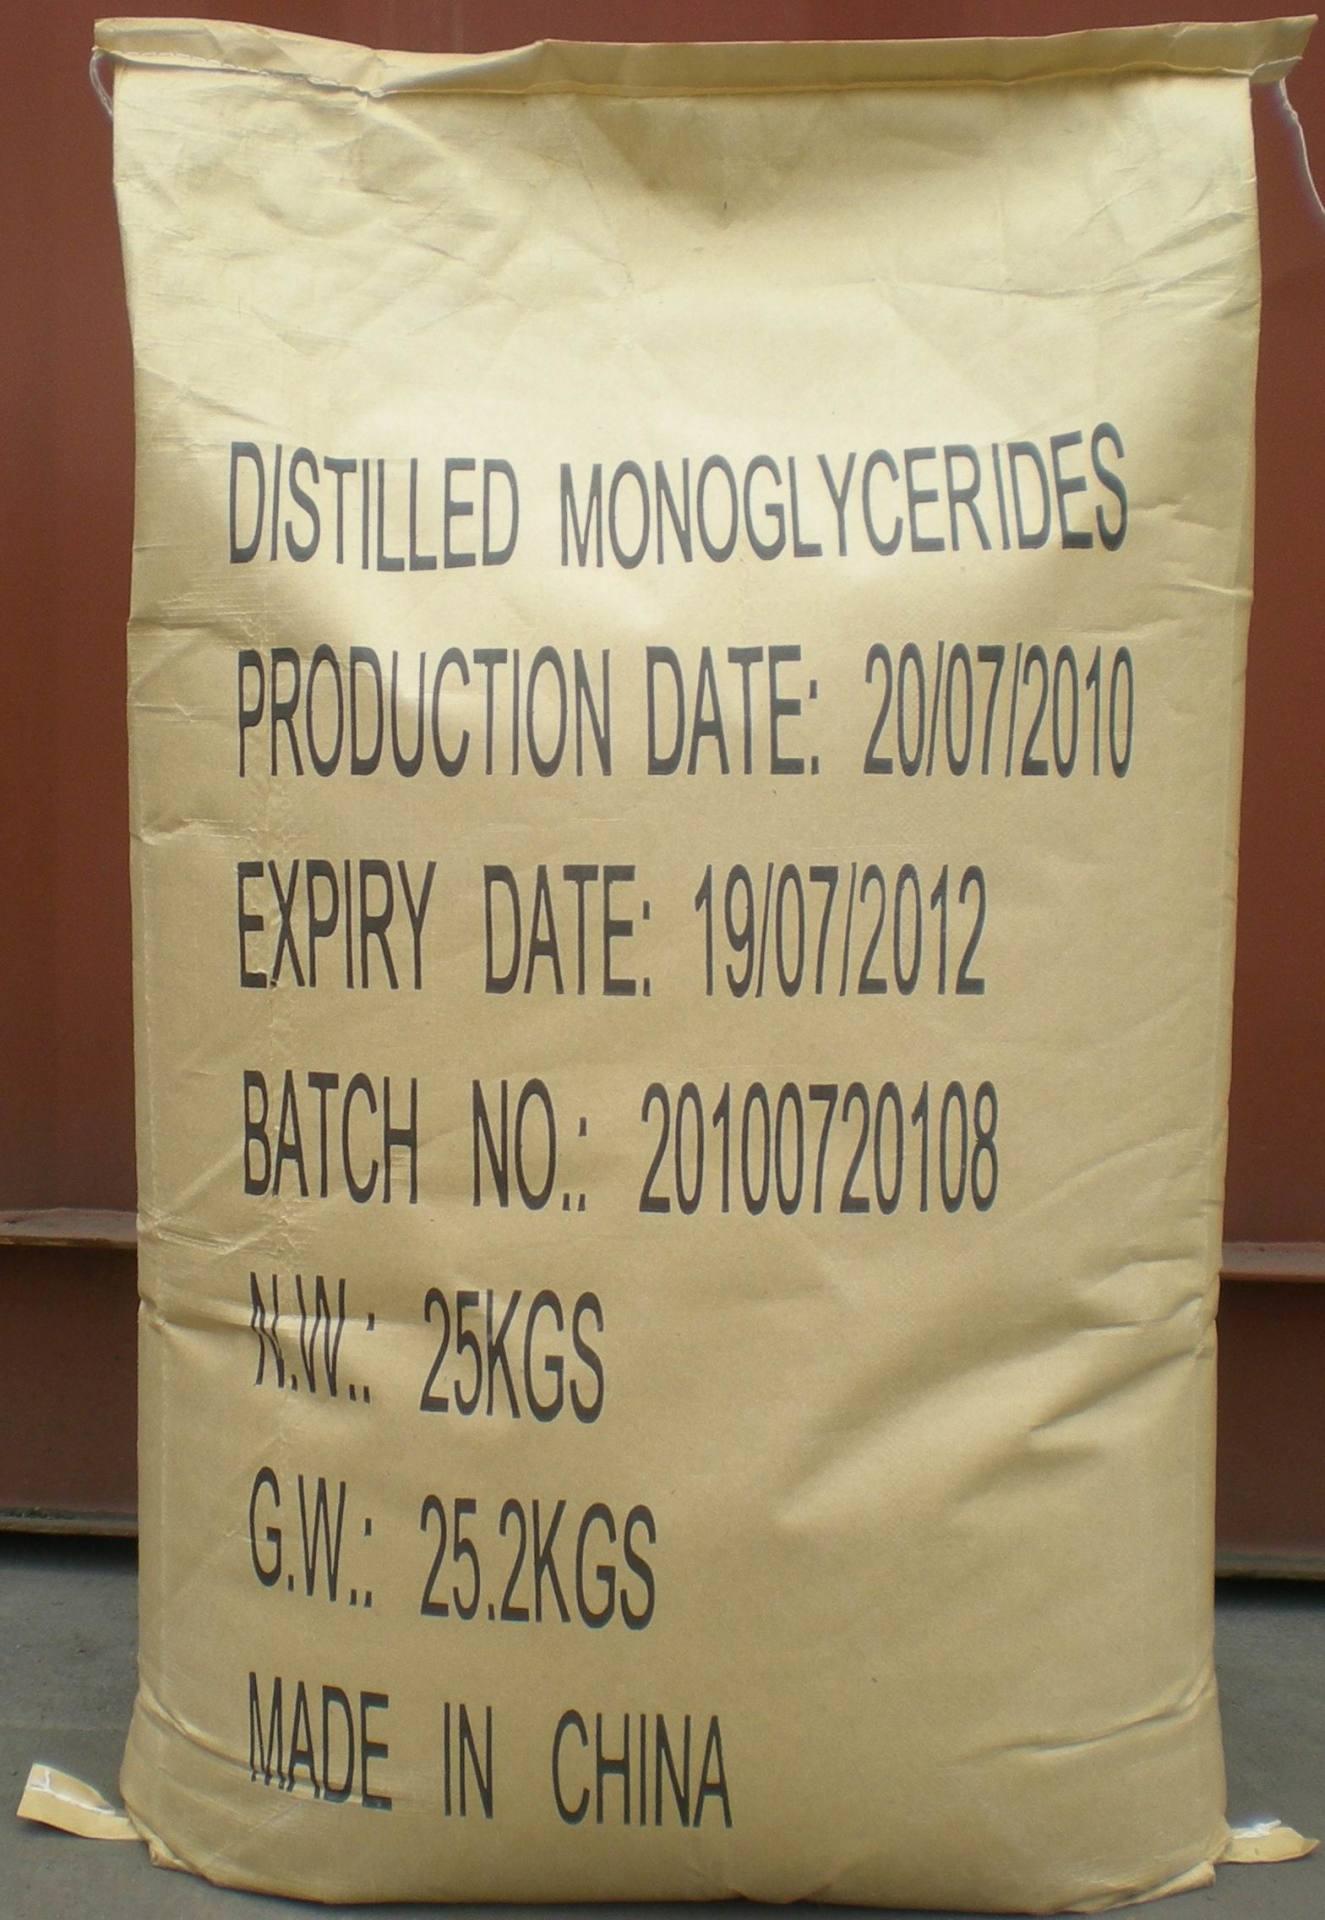 Distilled Monoglycerides Industrial Grade